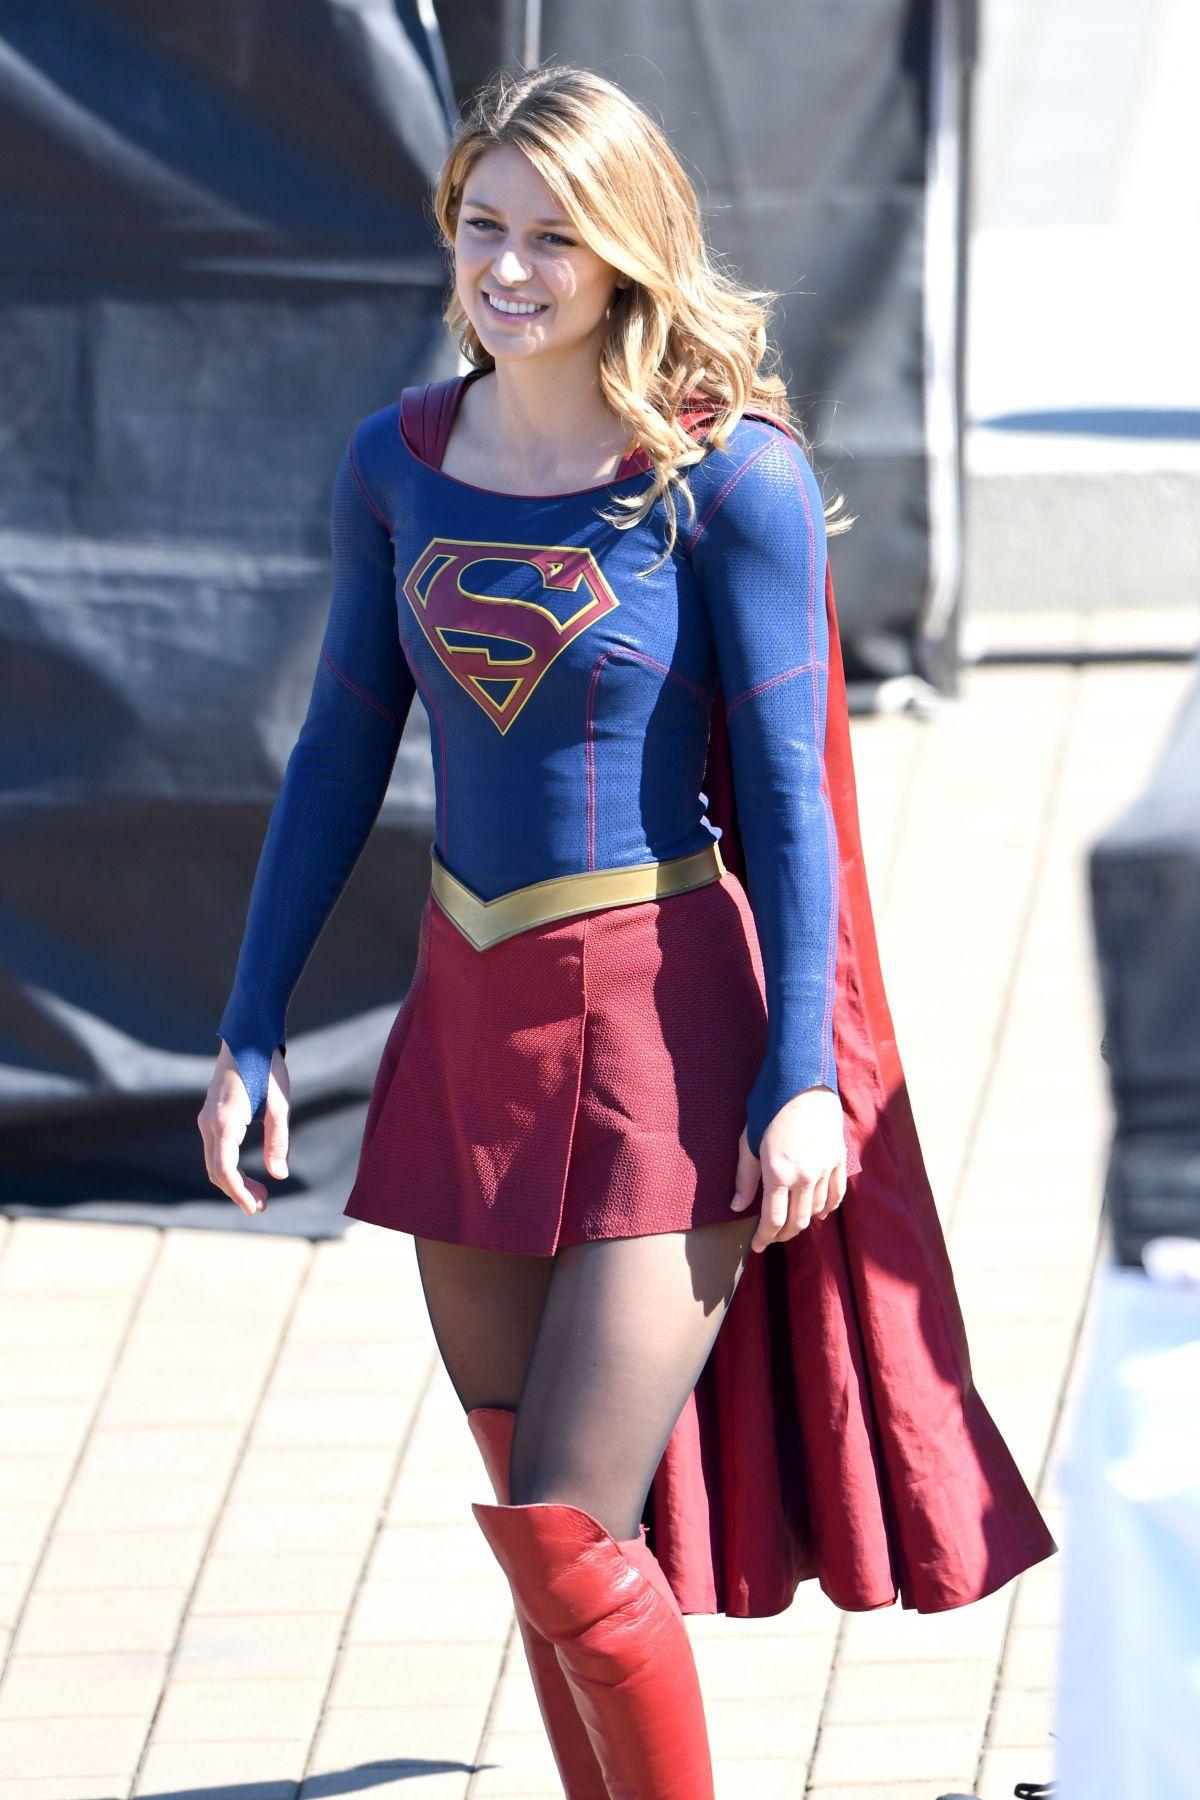 Marie Marie Supergirl